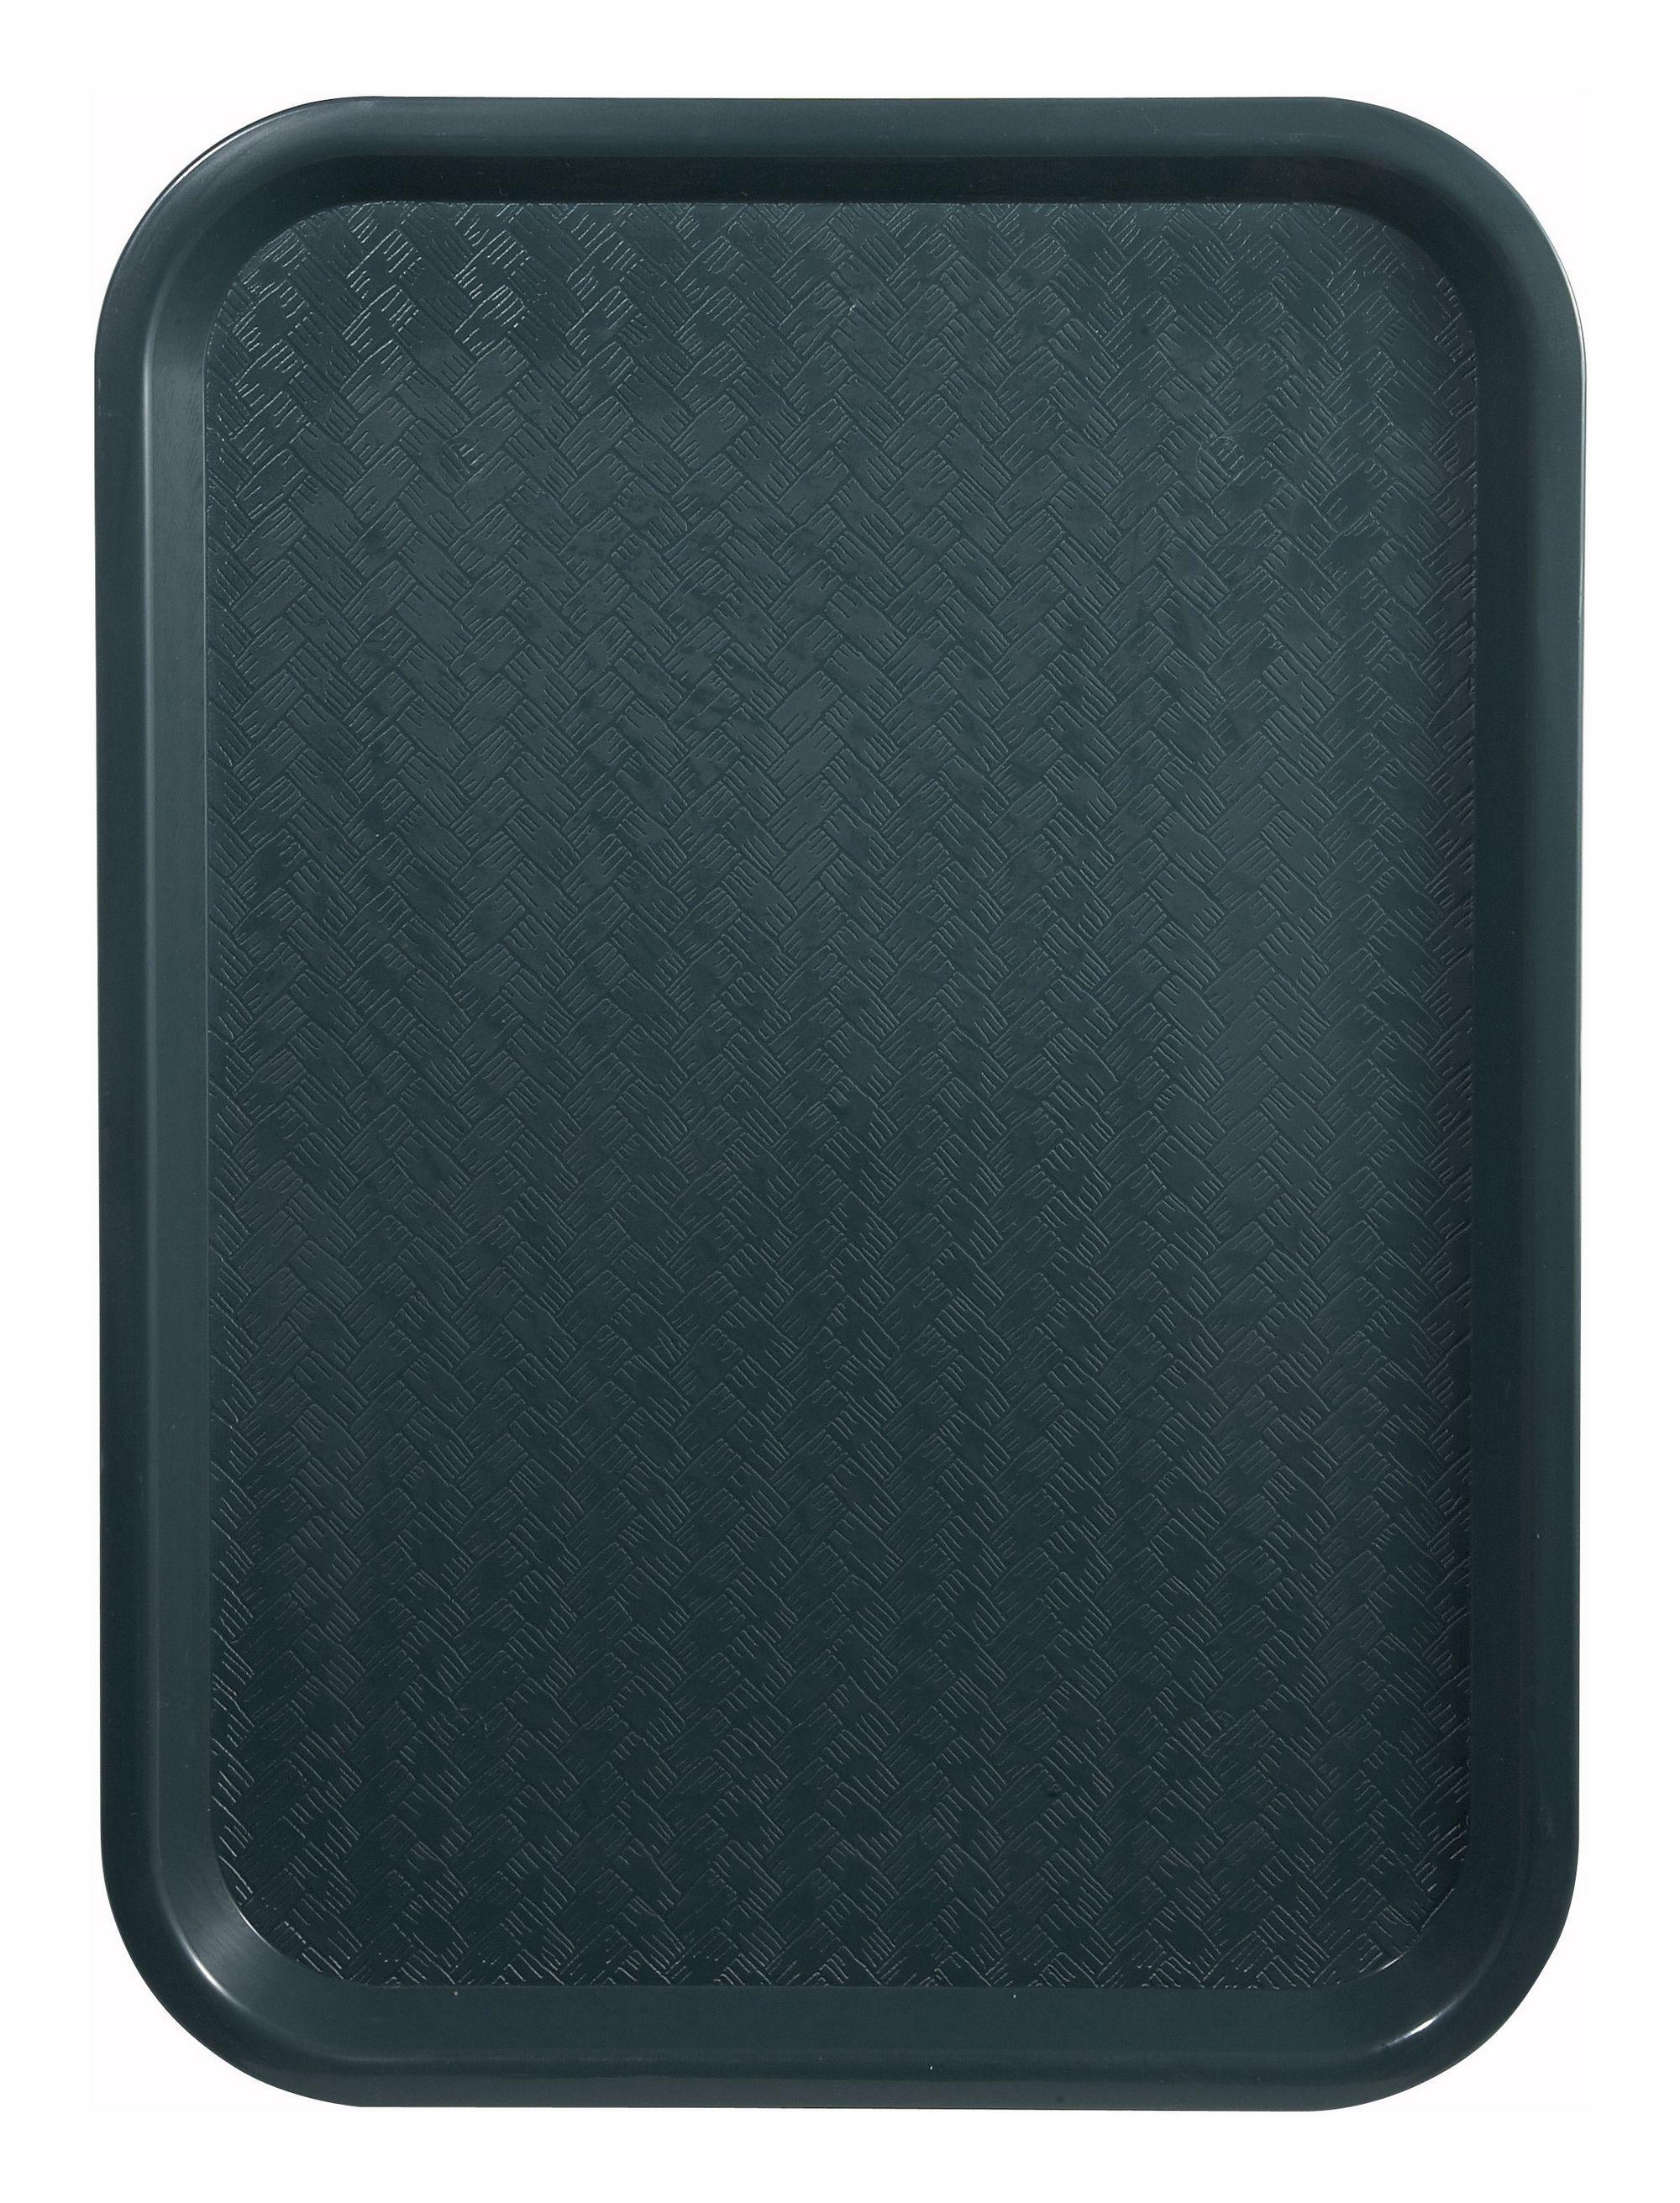 "Winco FFT-1418G Green Plastic Fast Food Tray 14"" x 18"""